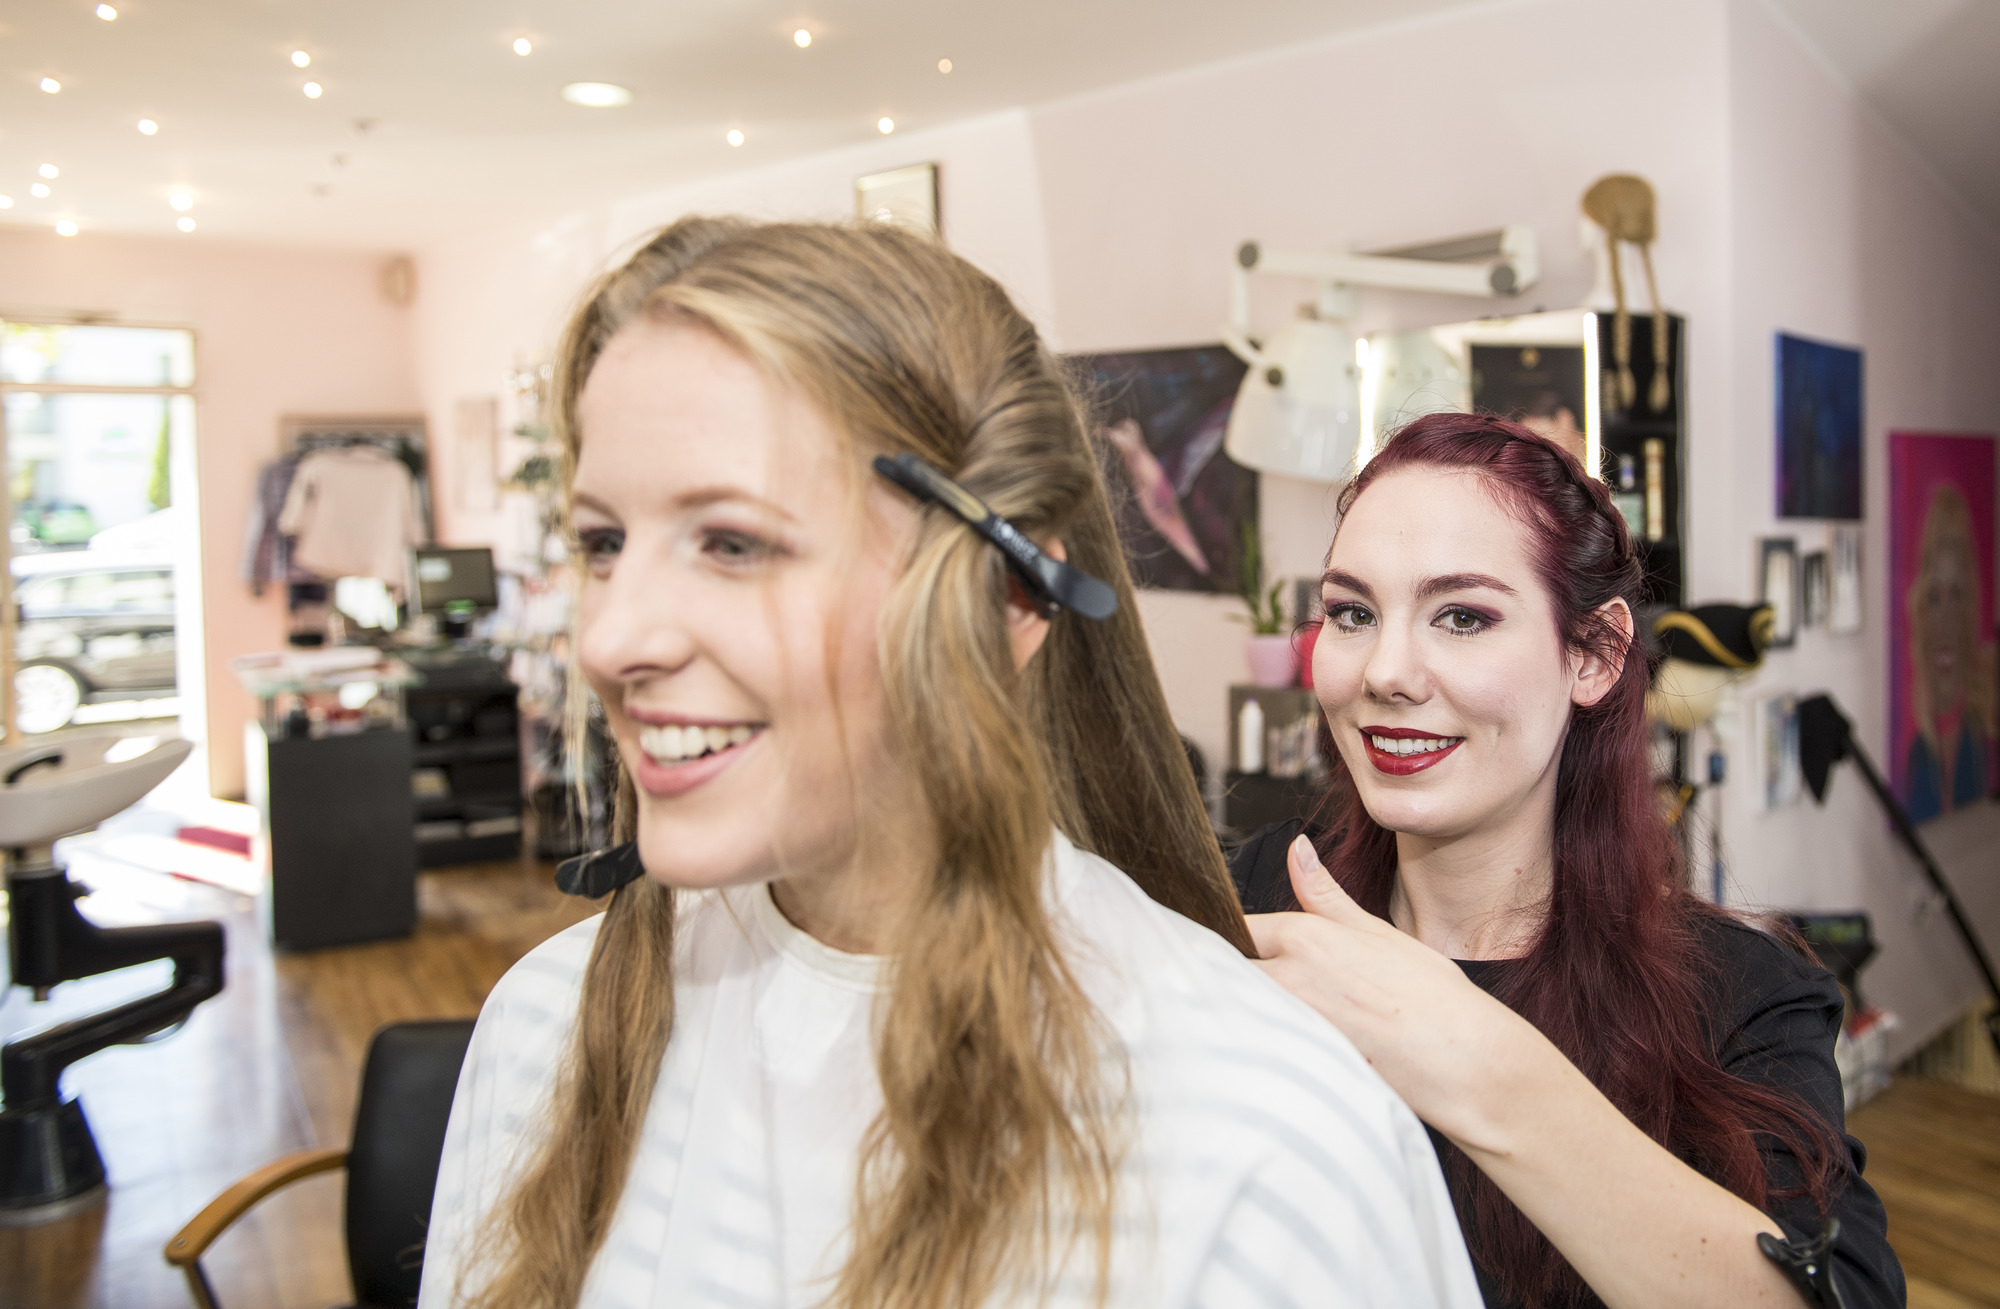 Friseur heidelberg dauerwelle